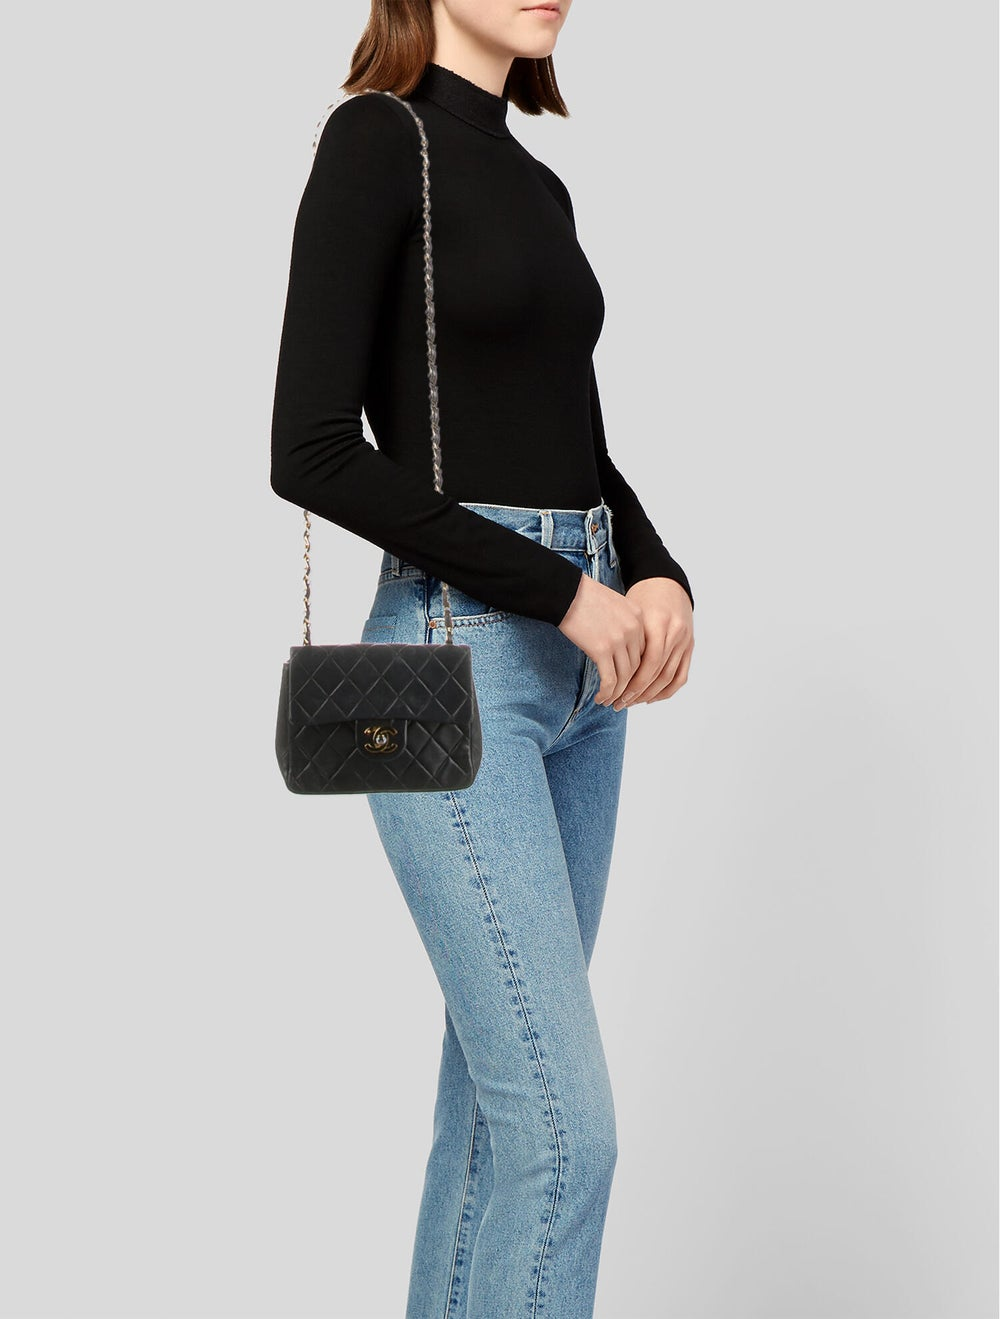 Chanel Vintage Classic Mini Square Flap Bag Blue - image 2